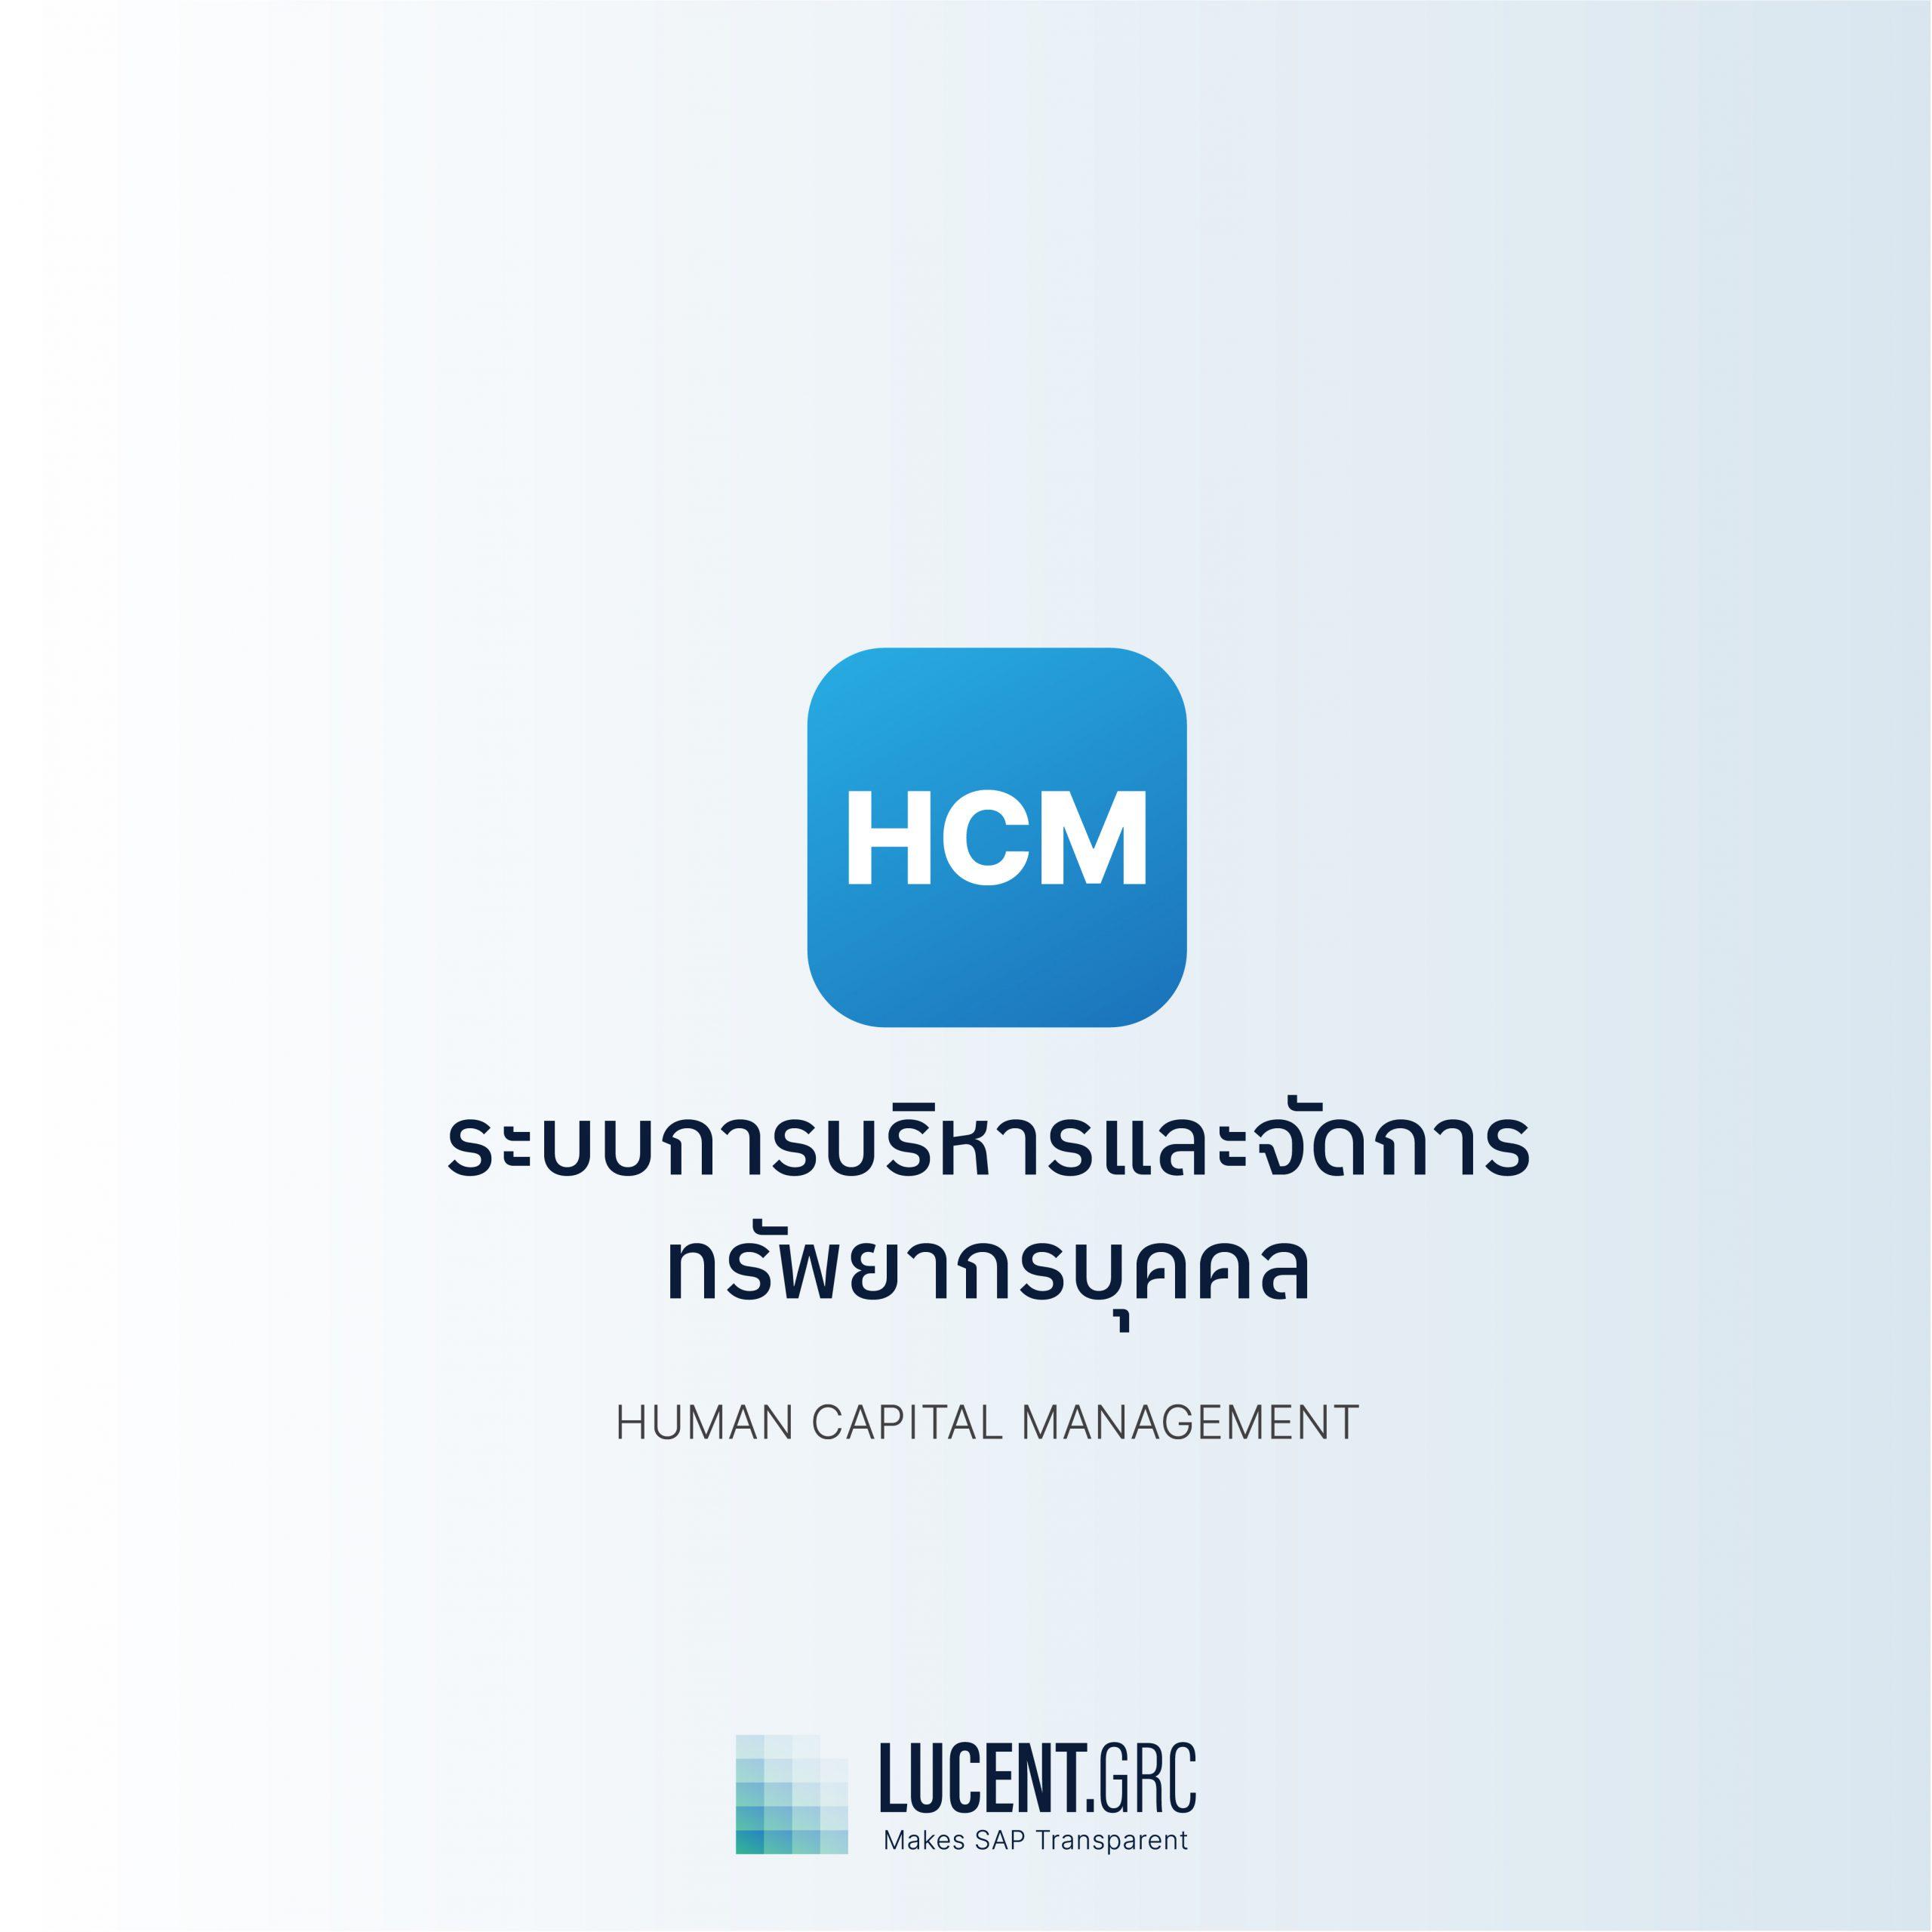 SAP HCM - Human Capital Management